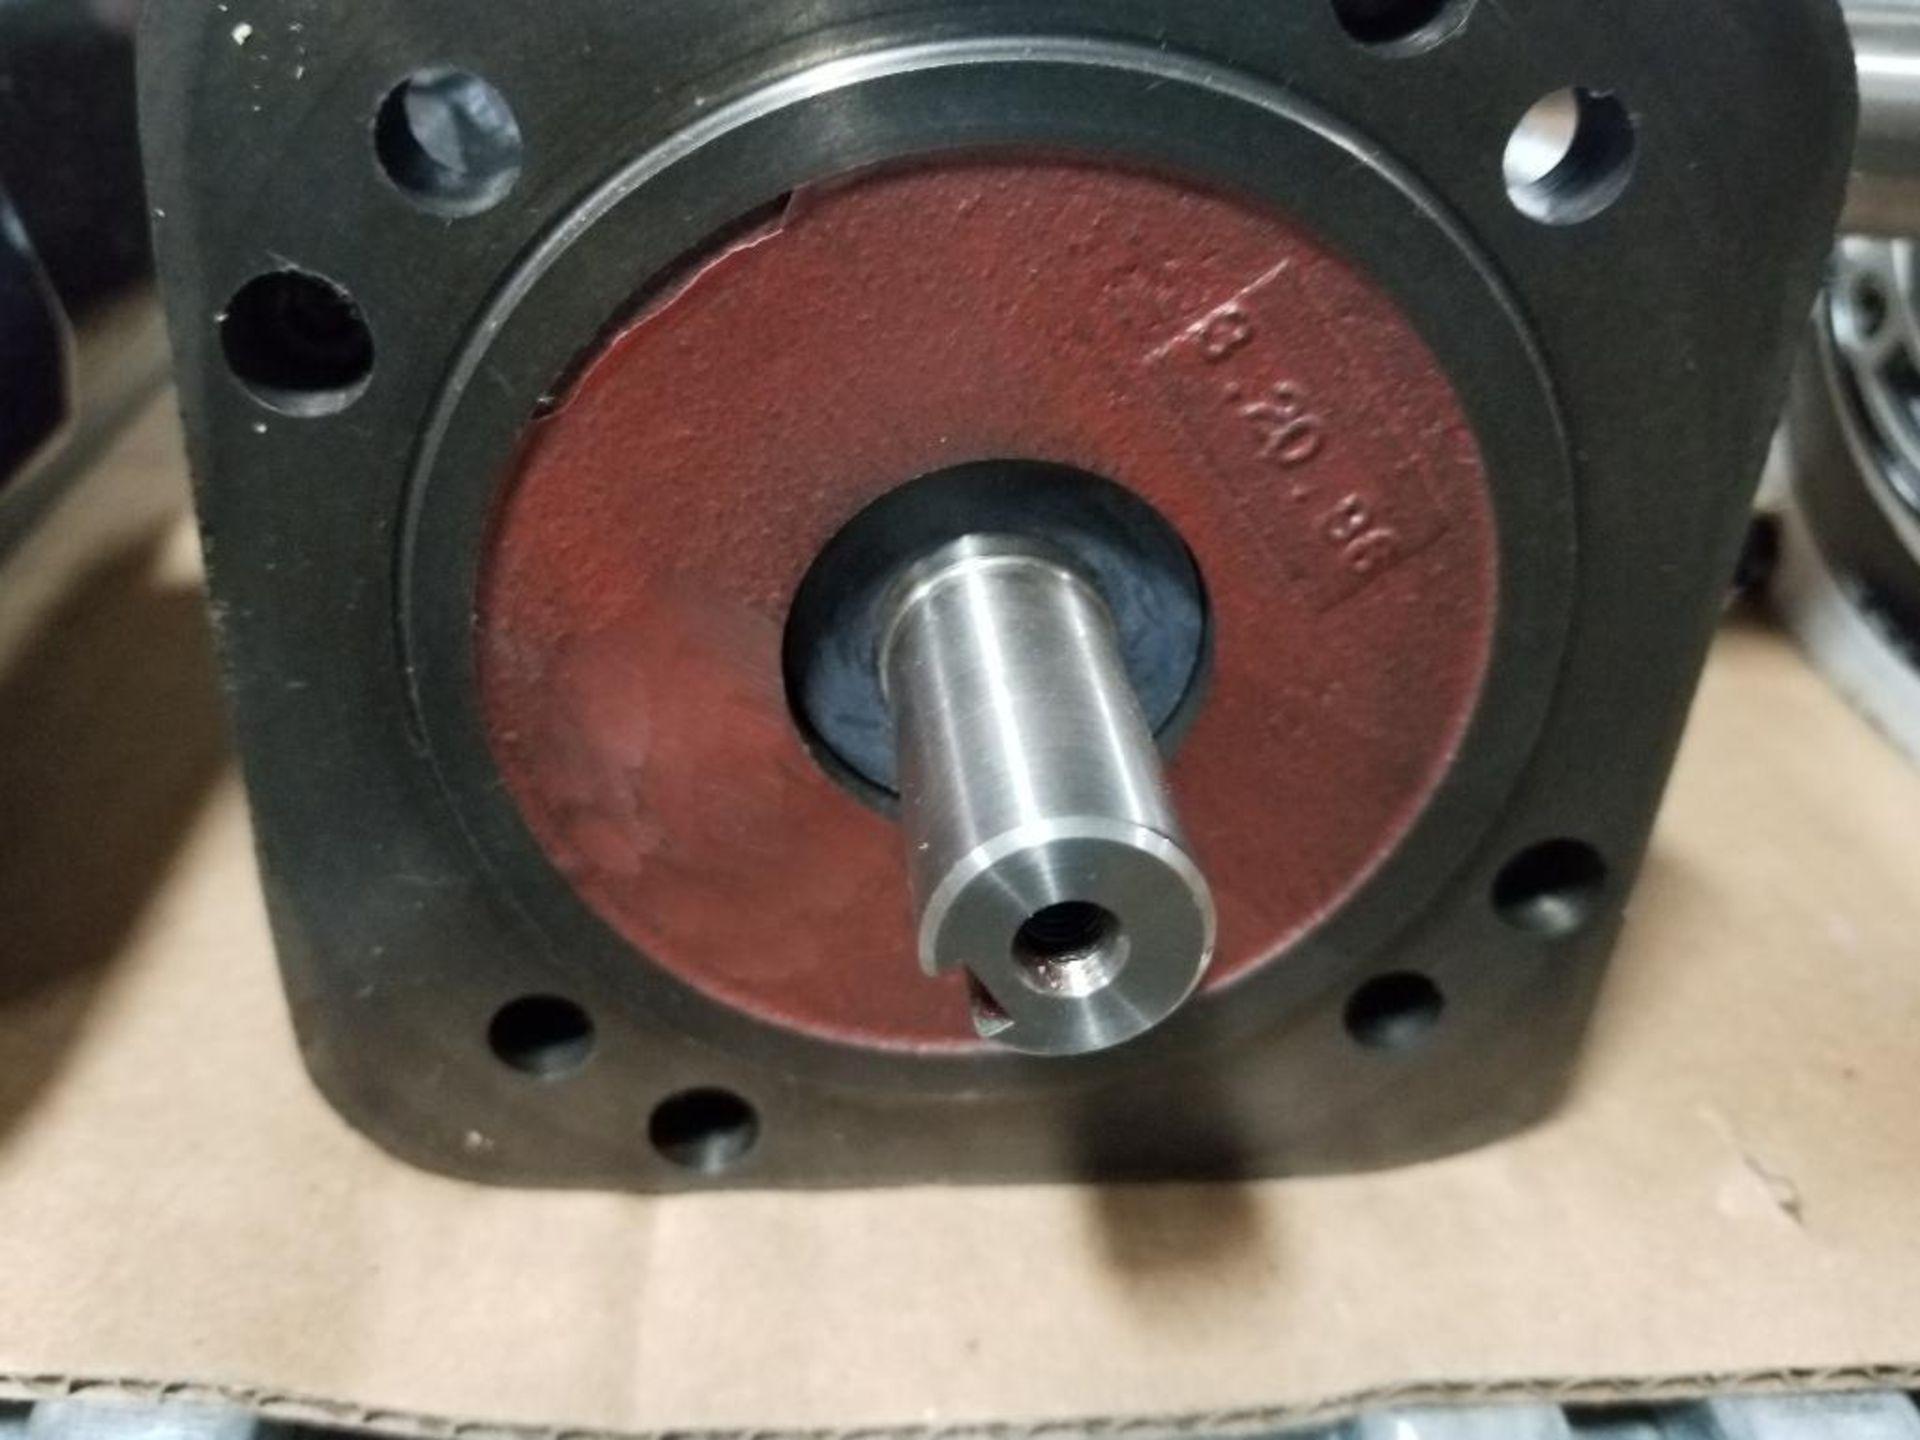 1kW Allen Bradley servo motor. Cat# 1326AB-B410G-21, Part# 155286, 5000RPM. - Image 2 of 6